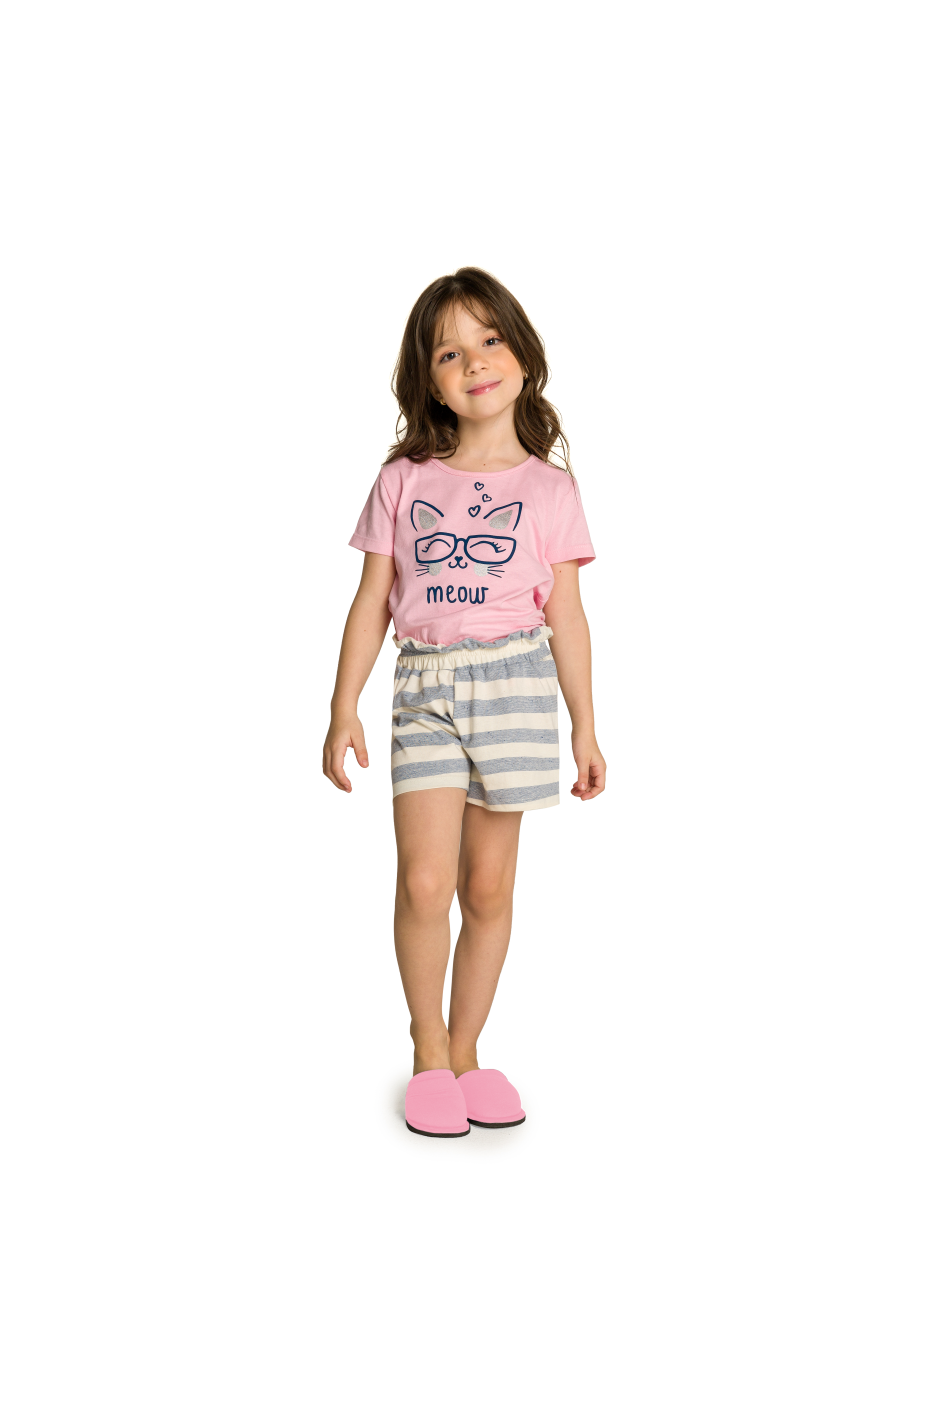 005/Q - Short Doll Infantil Feminino Familia Cats - Meow